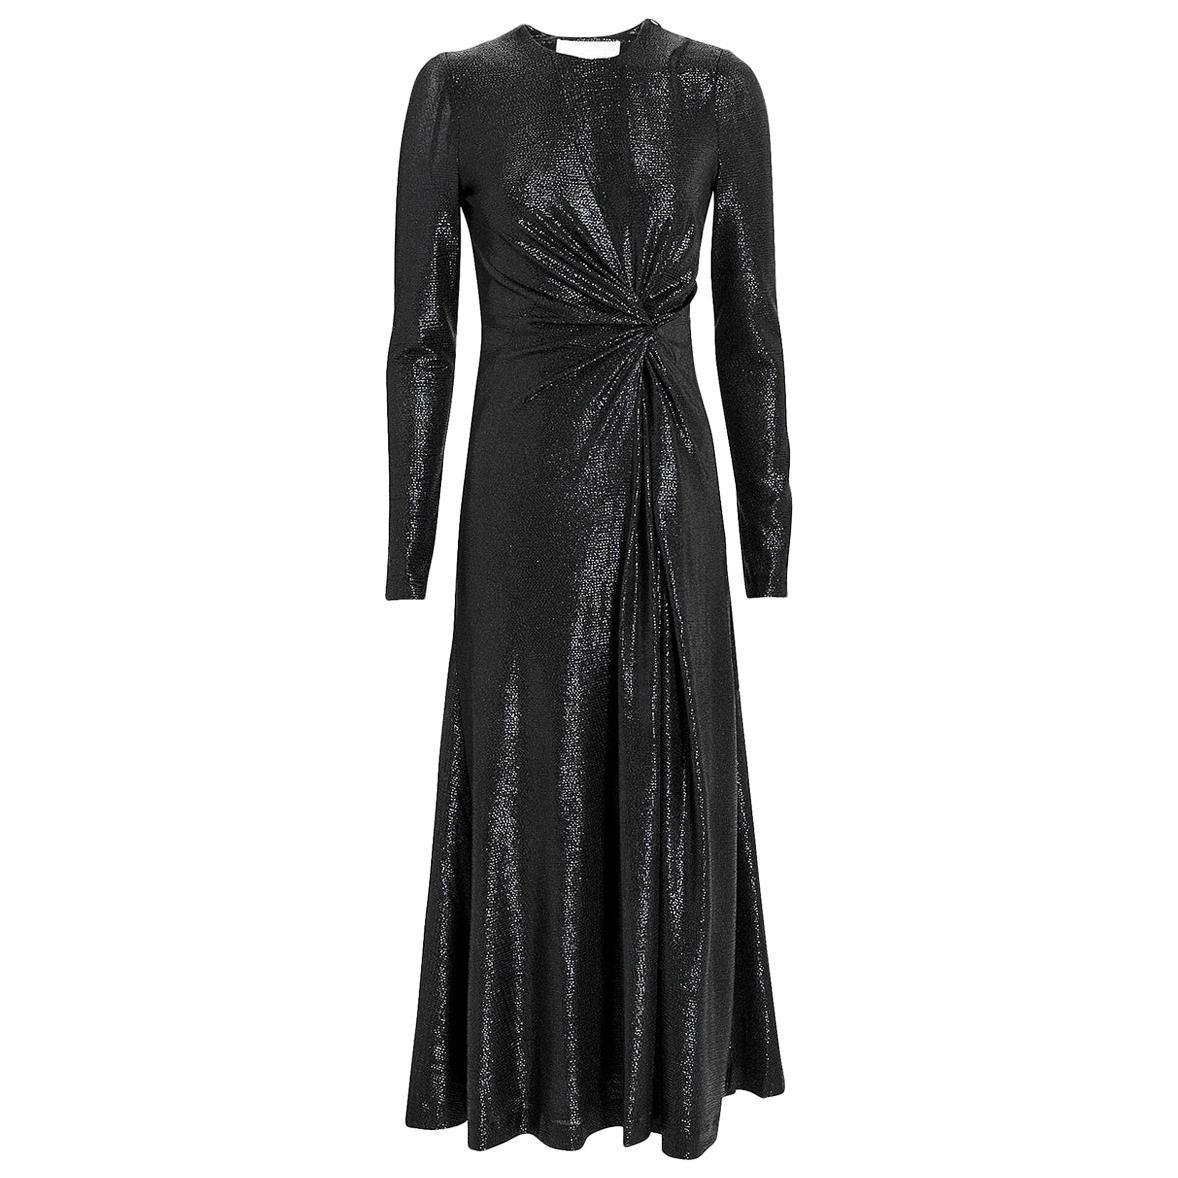 Galvan London Pinwheel Twisted Textured Midi Dress